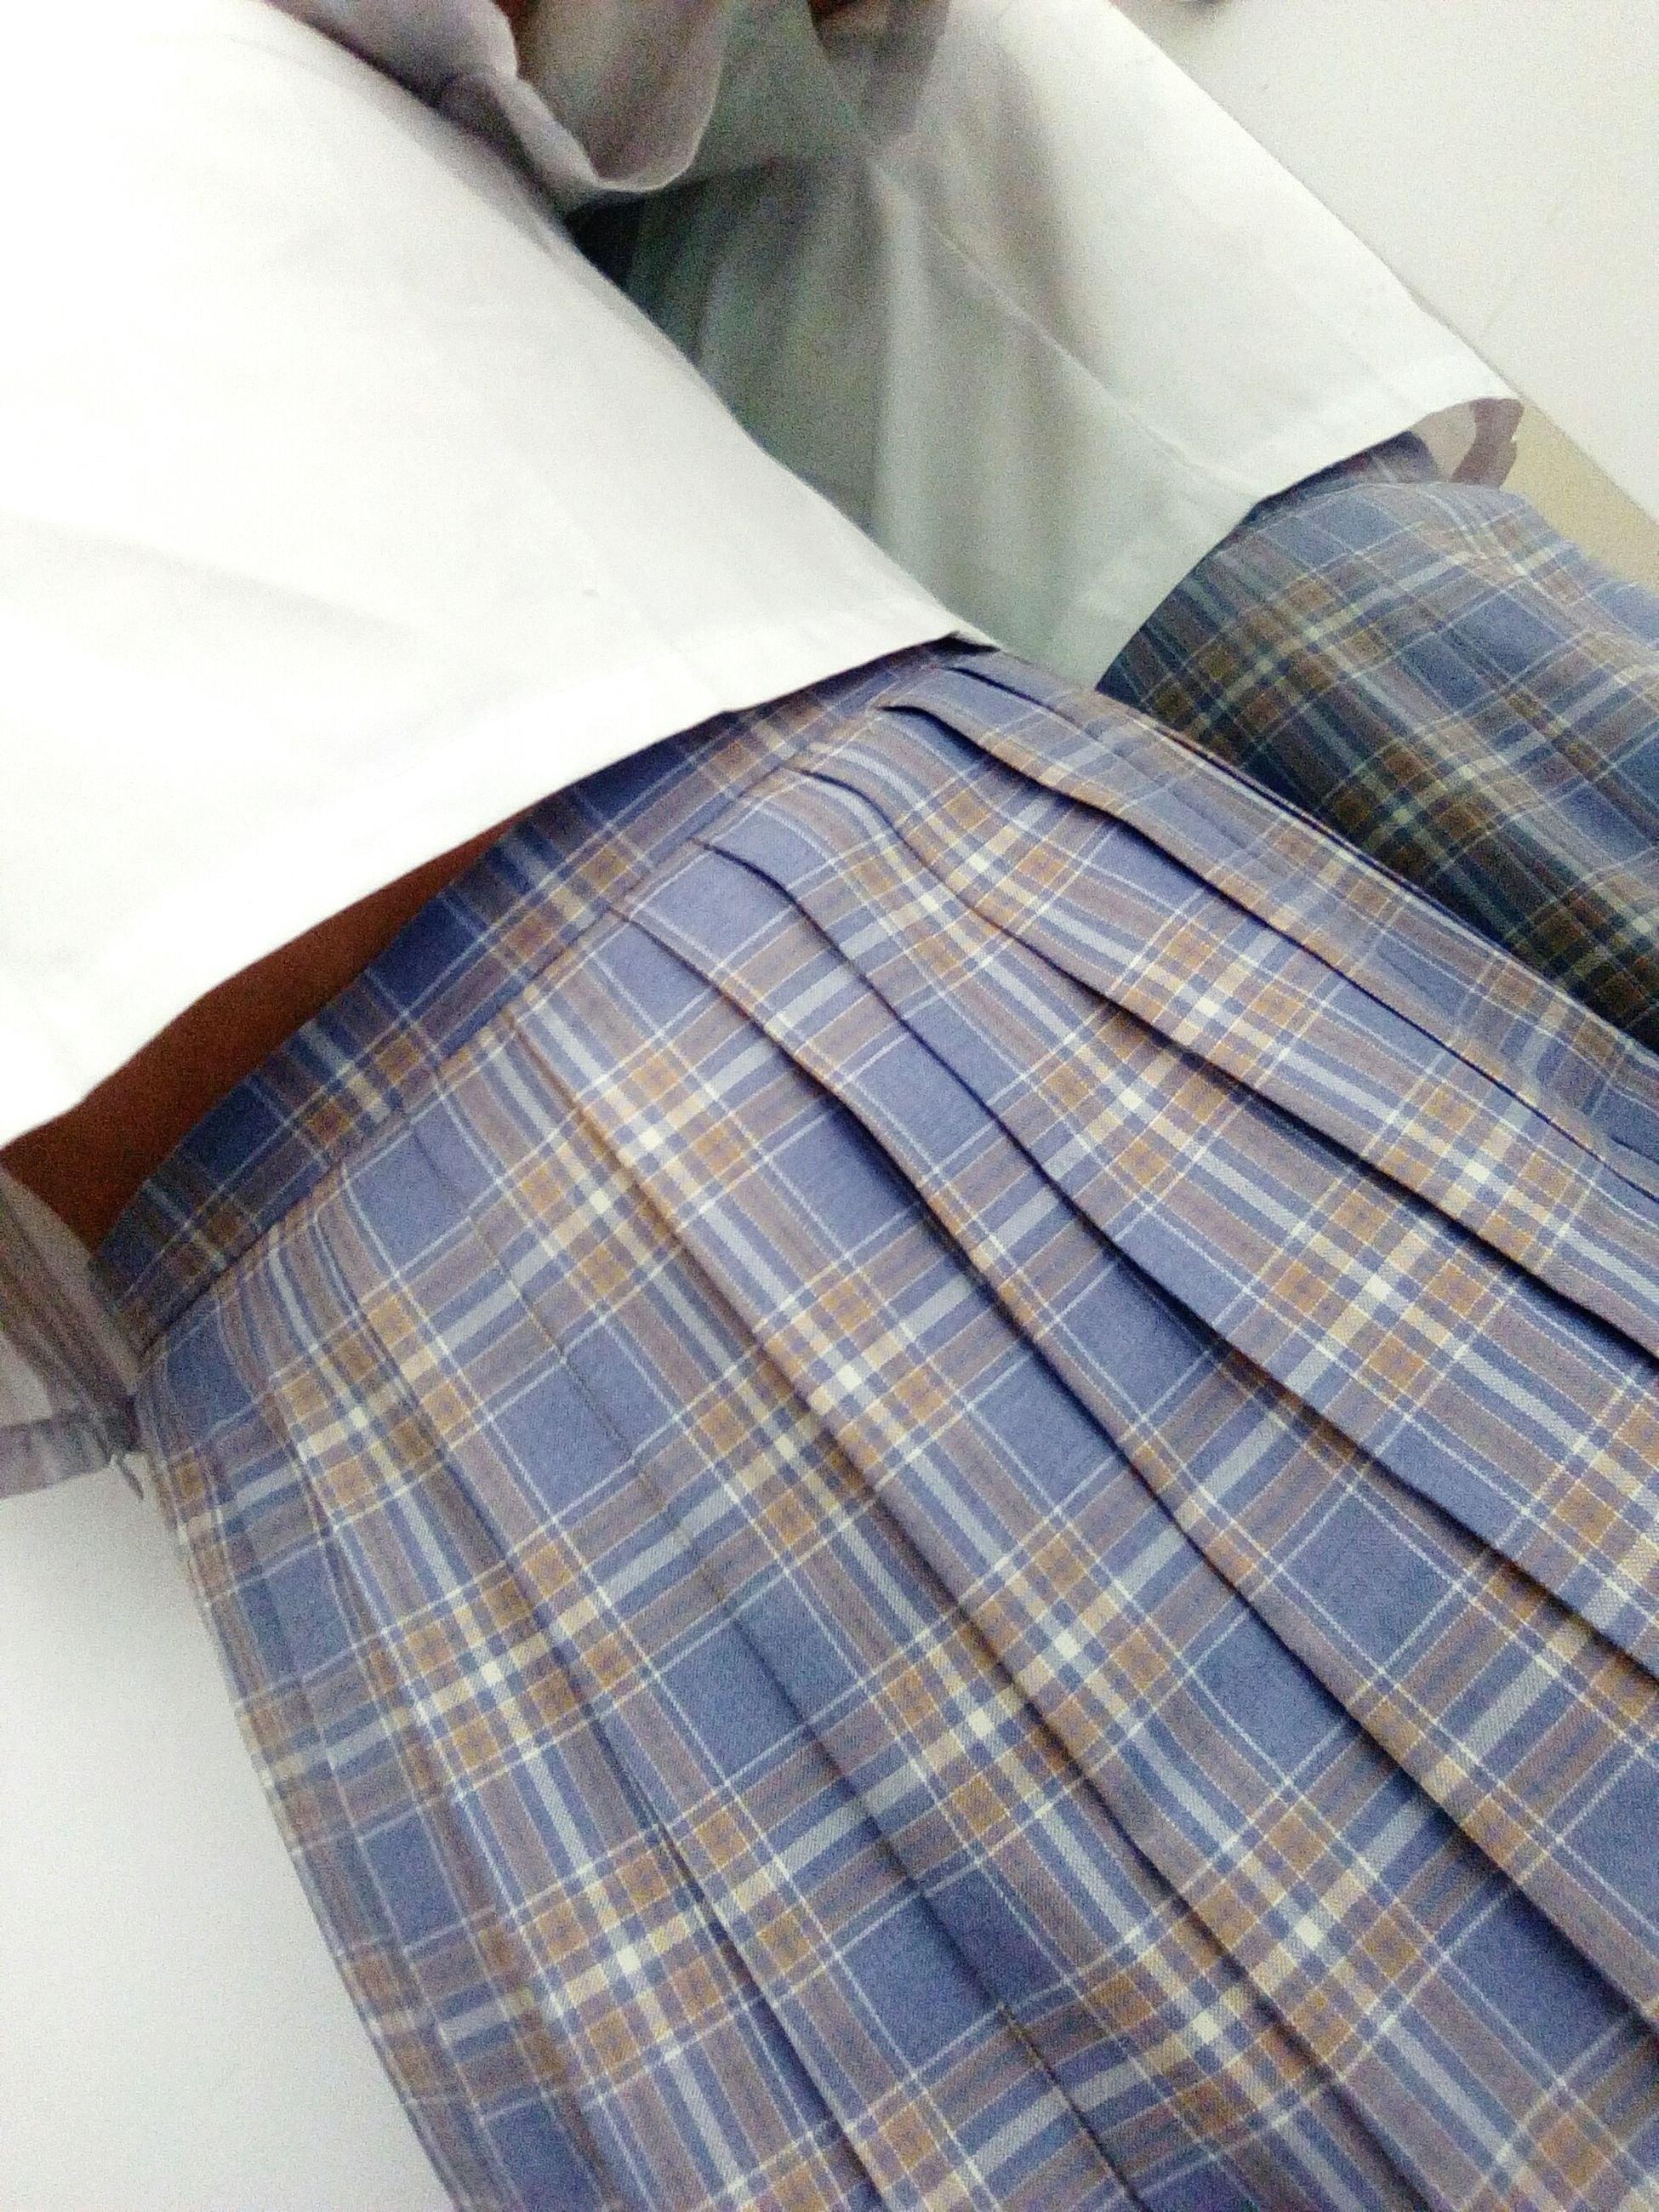 textile, fabric, close-up, sheet, full frame, design, backgrounds, part of, blue, detail, softness